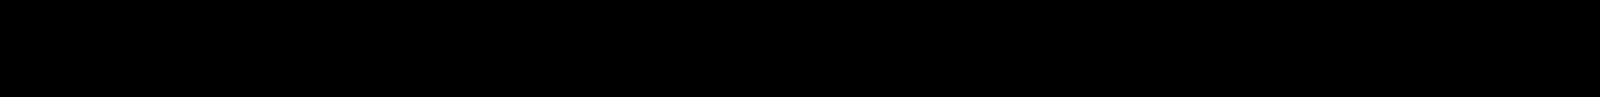 write Ionic equation as